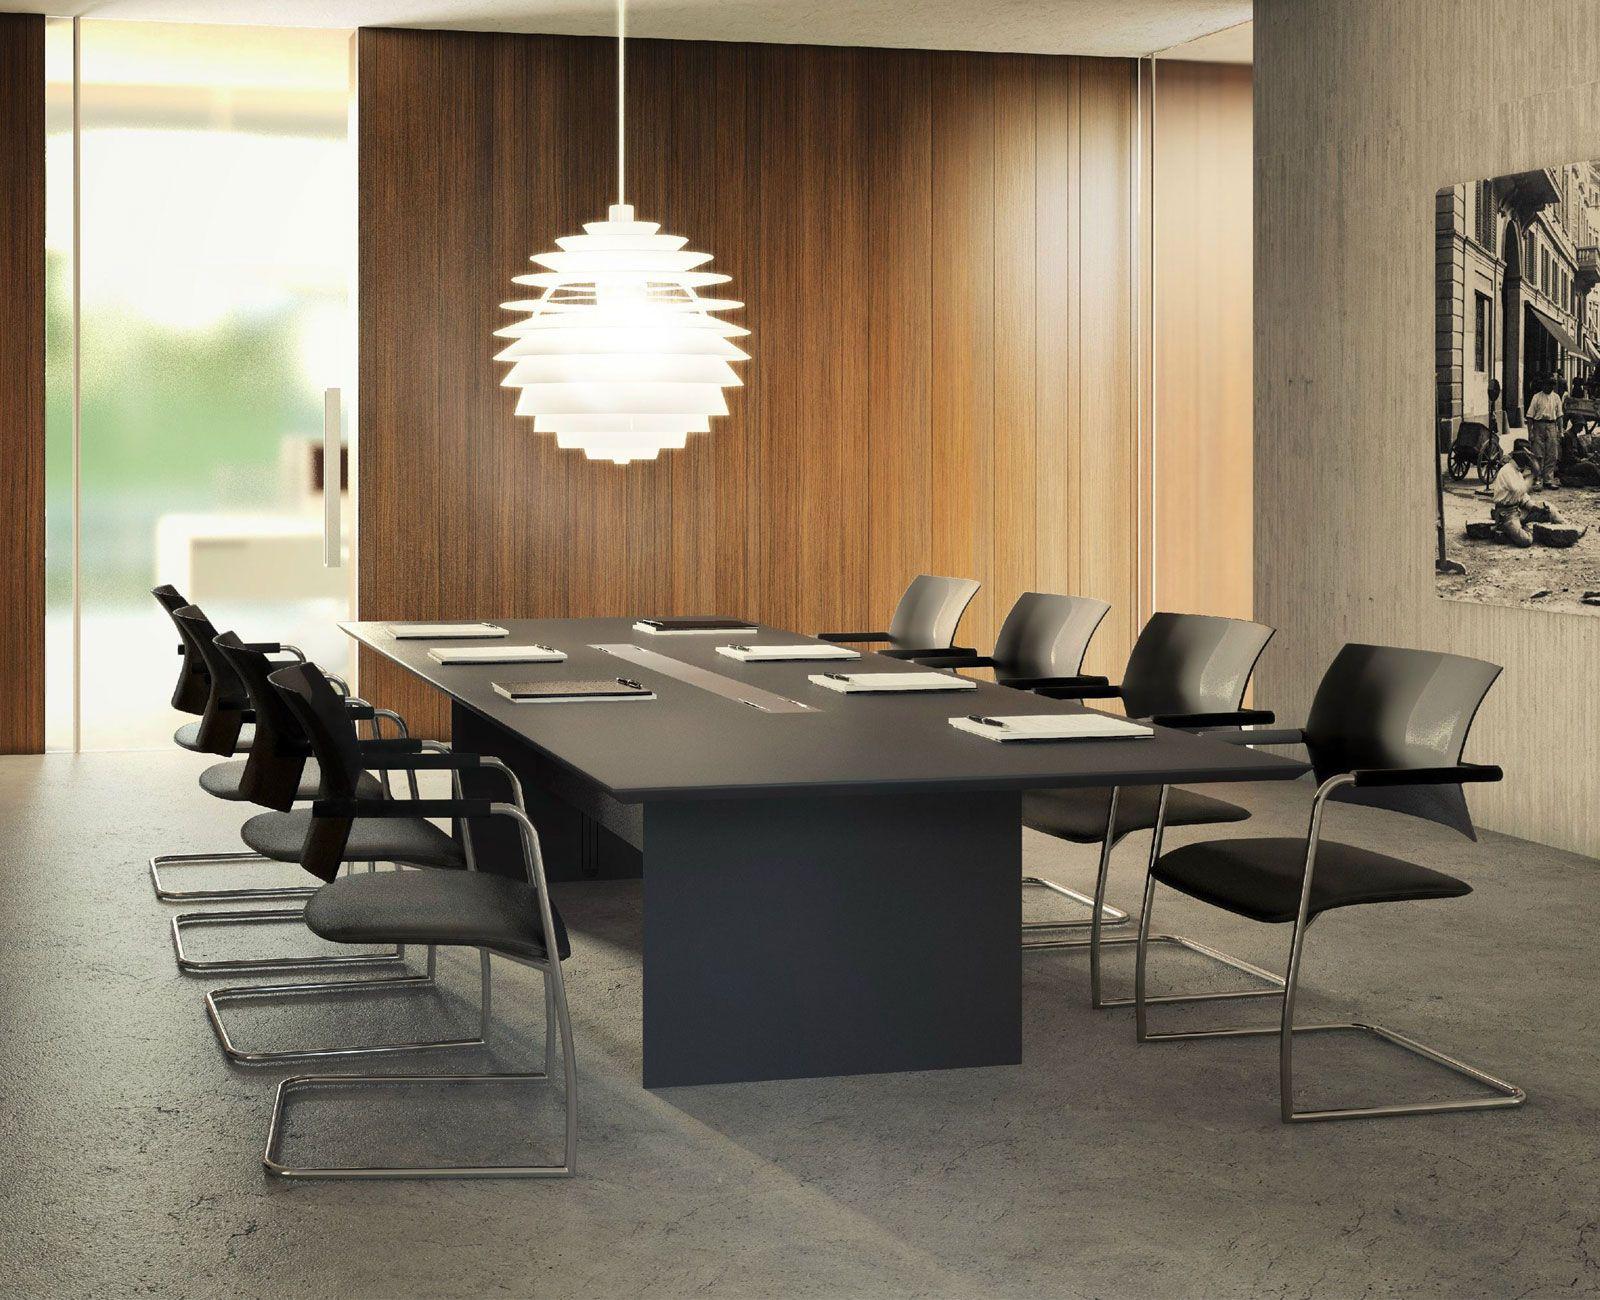 fantoni office furniture. Quaranta5 Meeting Table - Fantoni Forza. TableMeeting RoomsOffice Furniture Office